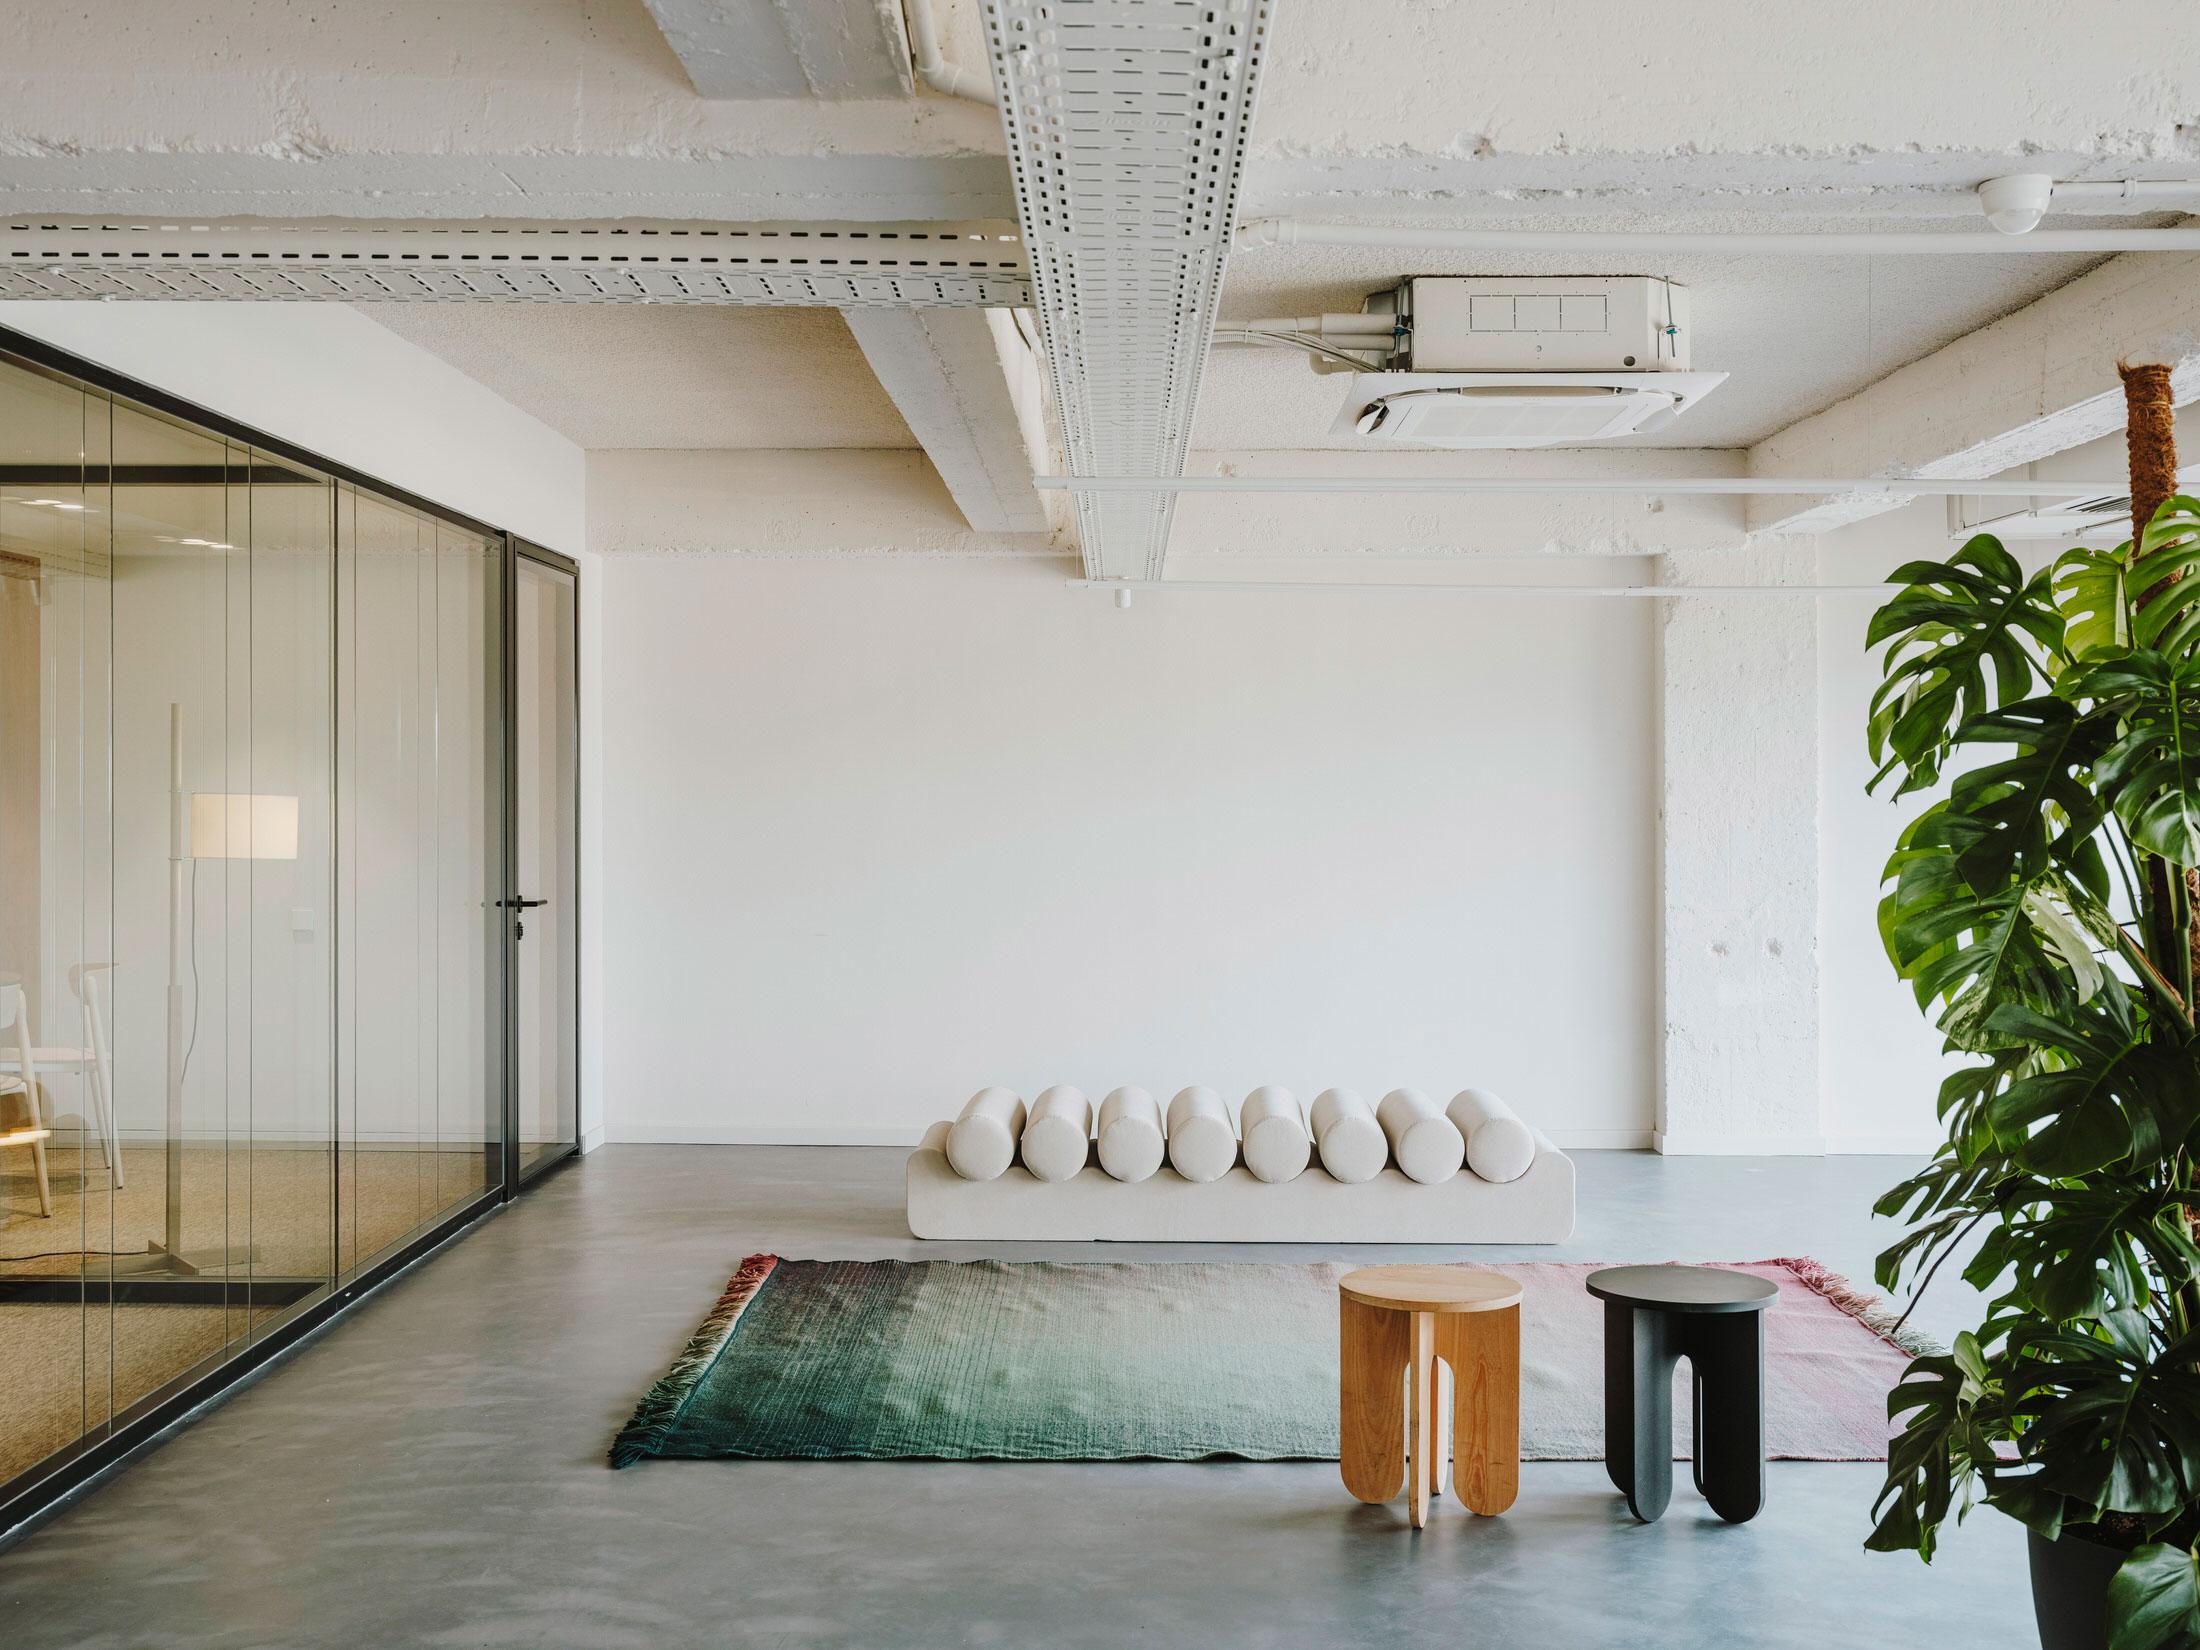 Mesura Architecture Design Cloudworks Penthouse Office Barcelona Photo Salva Lopez Yellowtrace 17